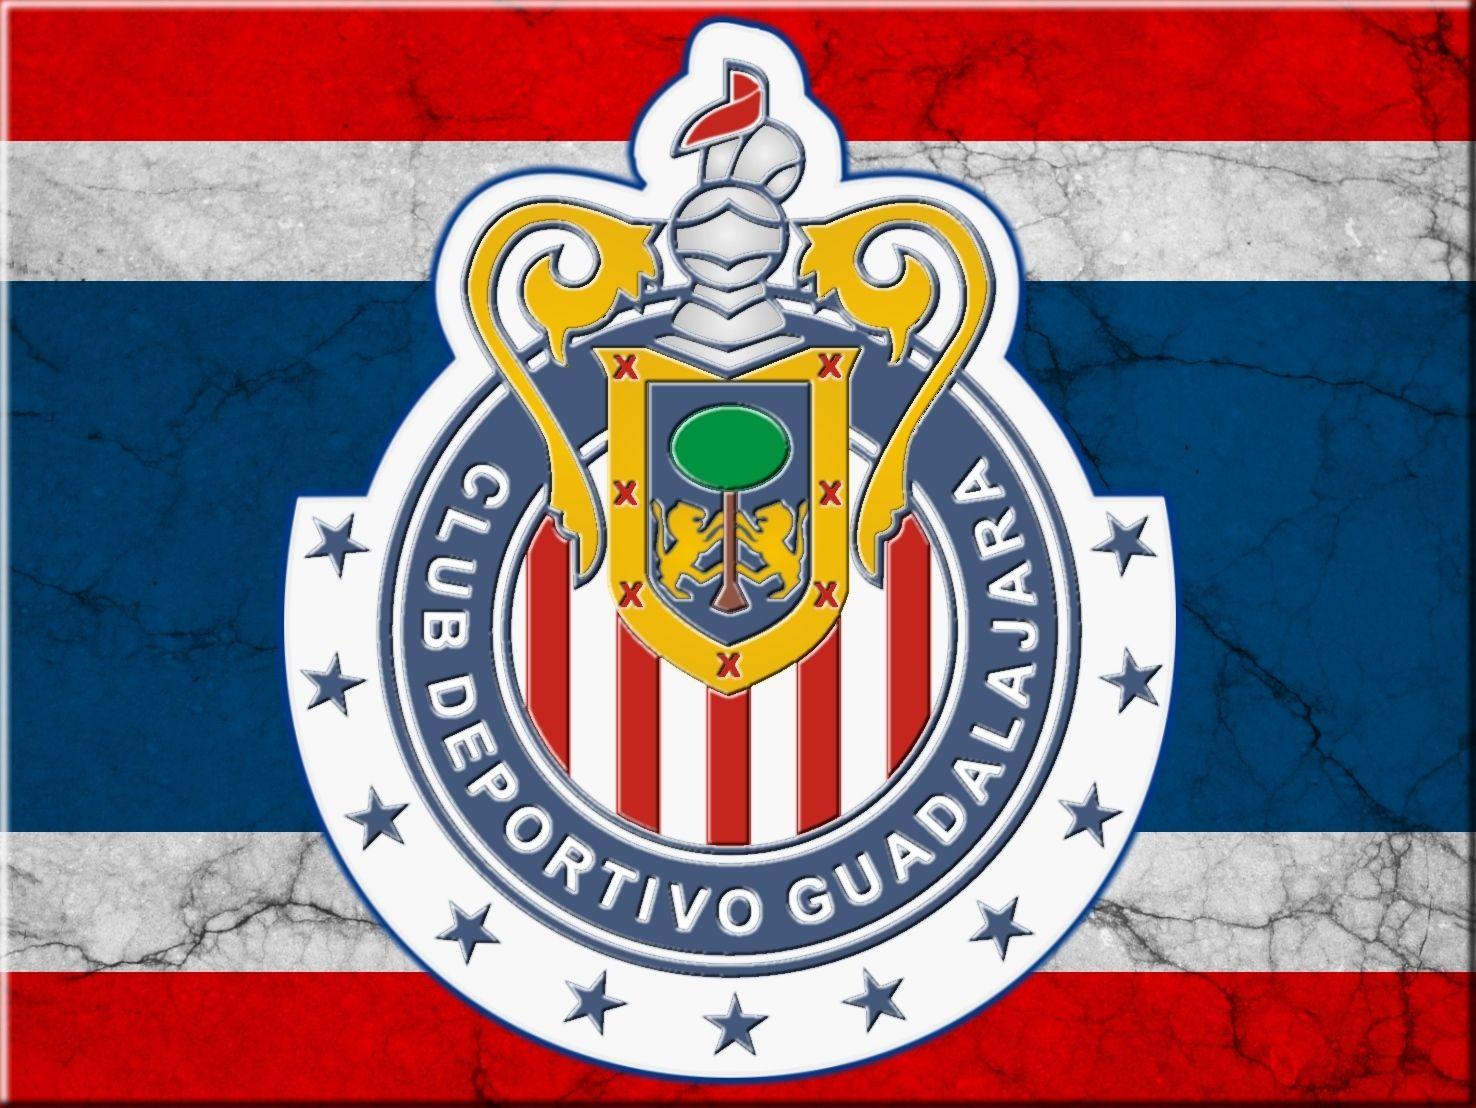 Httpacuityorgwallstockchivas guadalajara logo escudo httpacuityorgwallstockchivas guadalajara voltagebd Choice Image